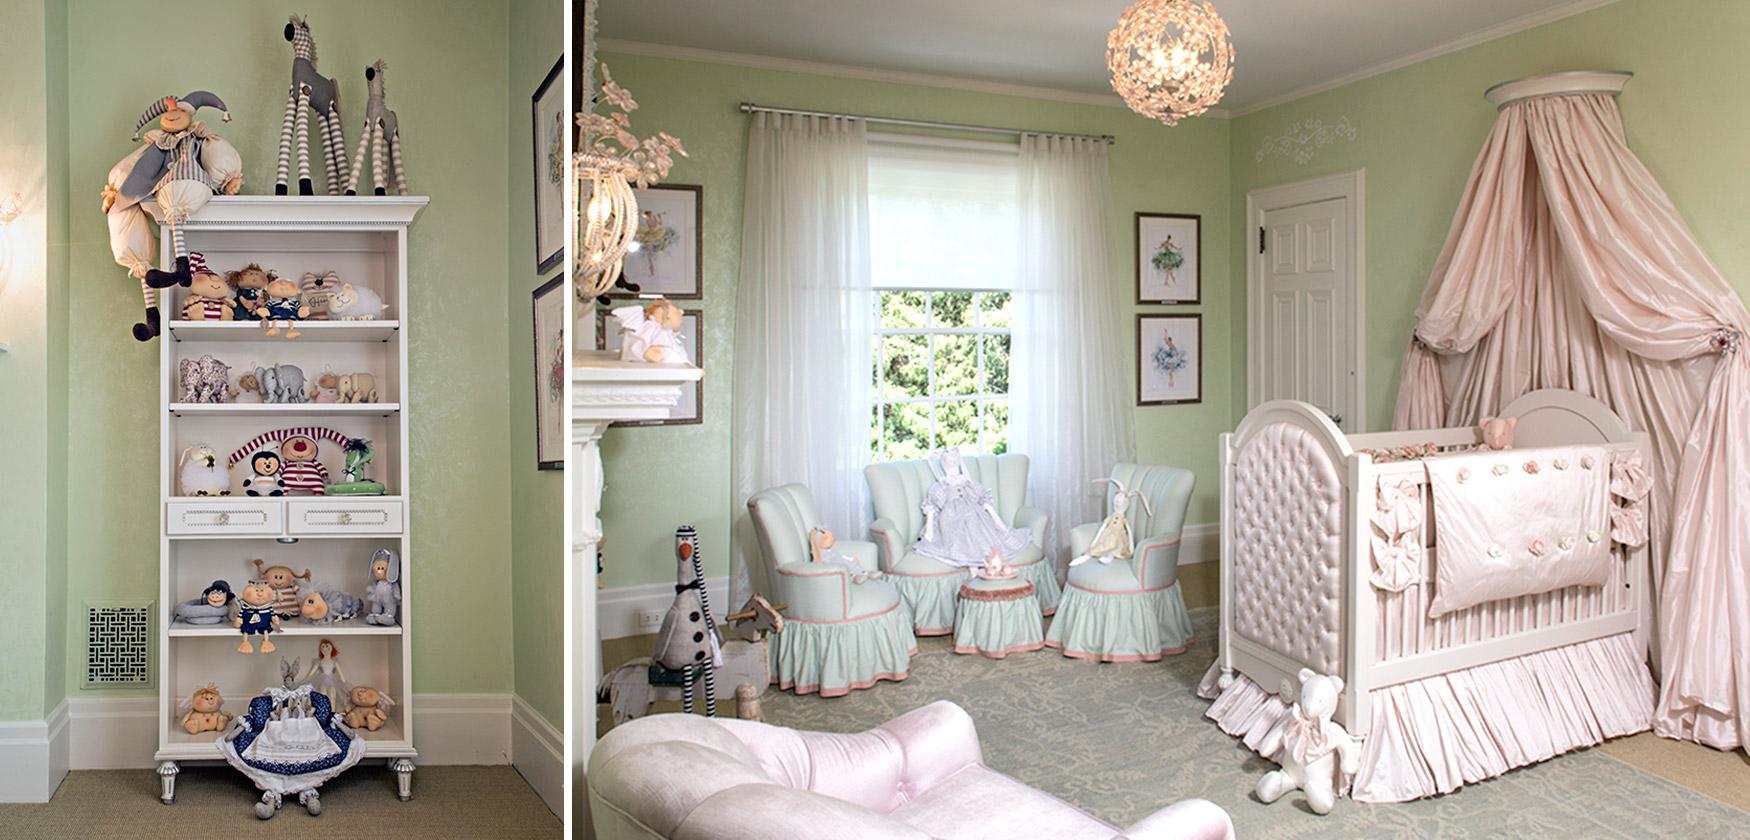 Baby Nursery Interior Design Sleeping Beauty Zoyab Ny